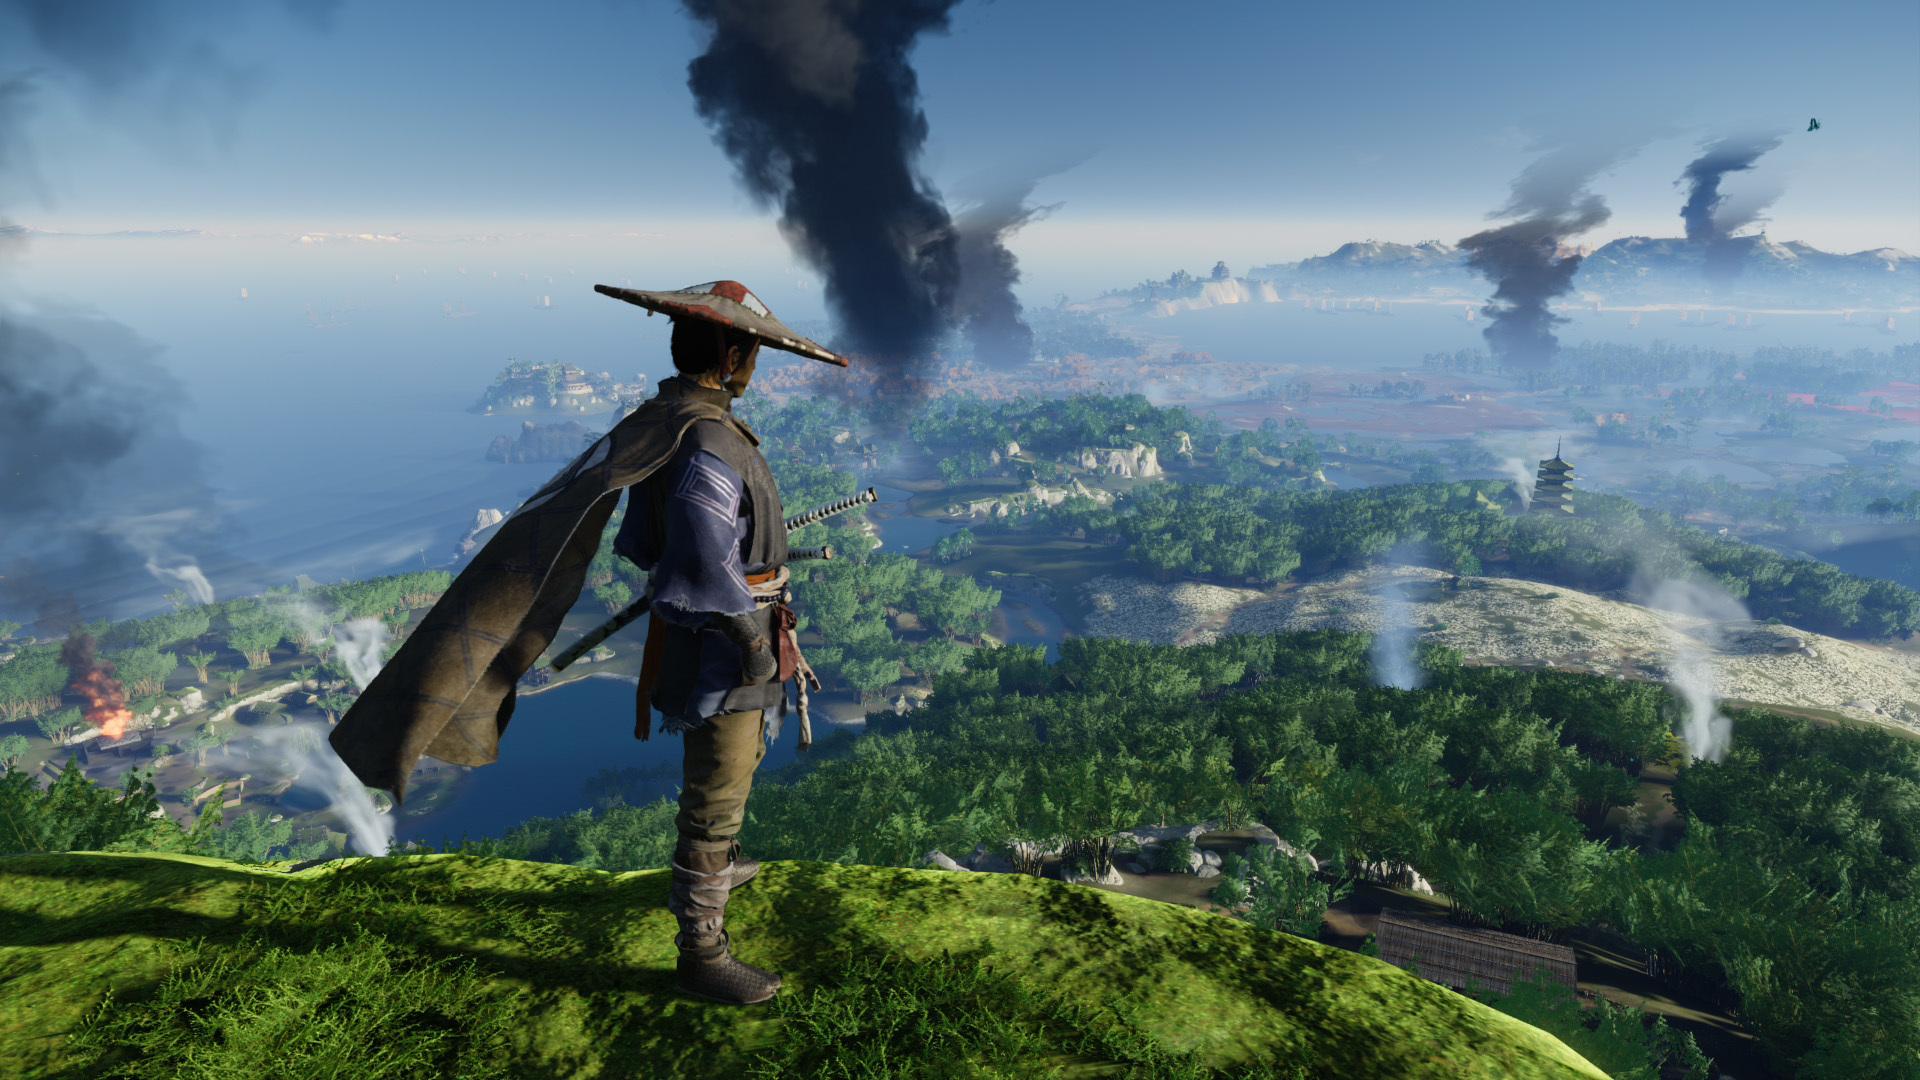 《对马岛之鬼》评分解禁:IGN 9分 GameSpot 7分